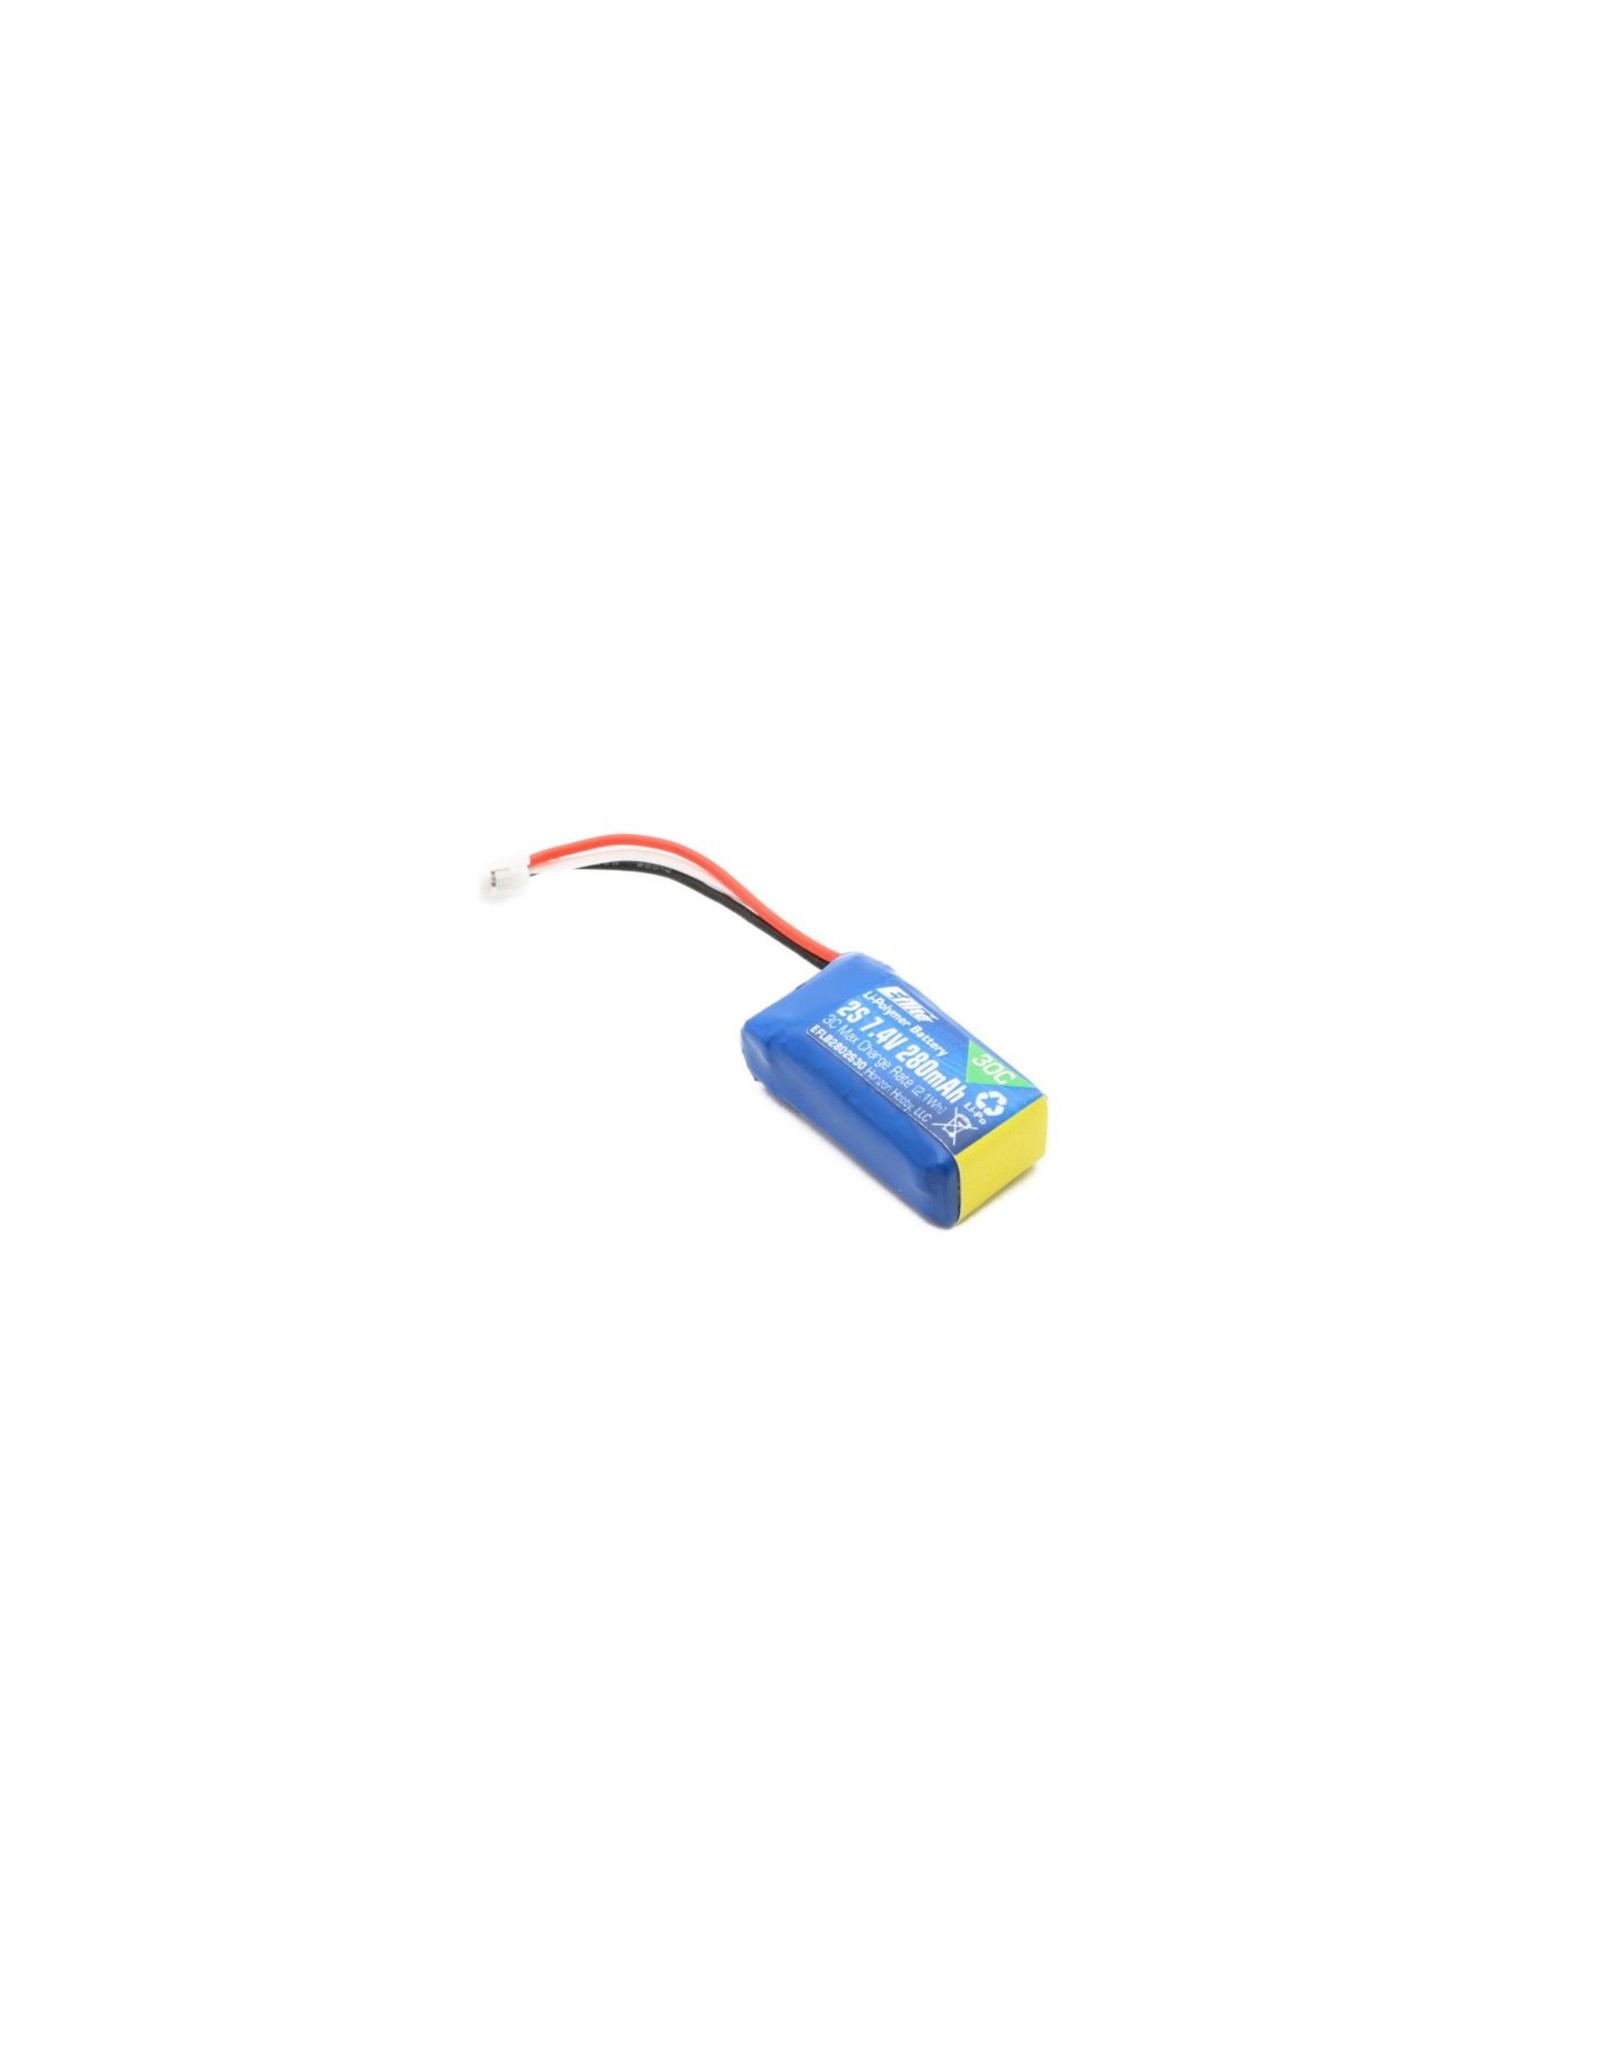 Eflite 280mAh 2S 7.4V 30C LiPo Battery  (EFLB2802S30)